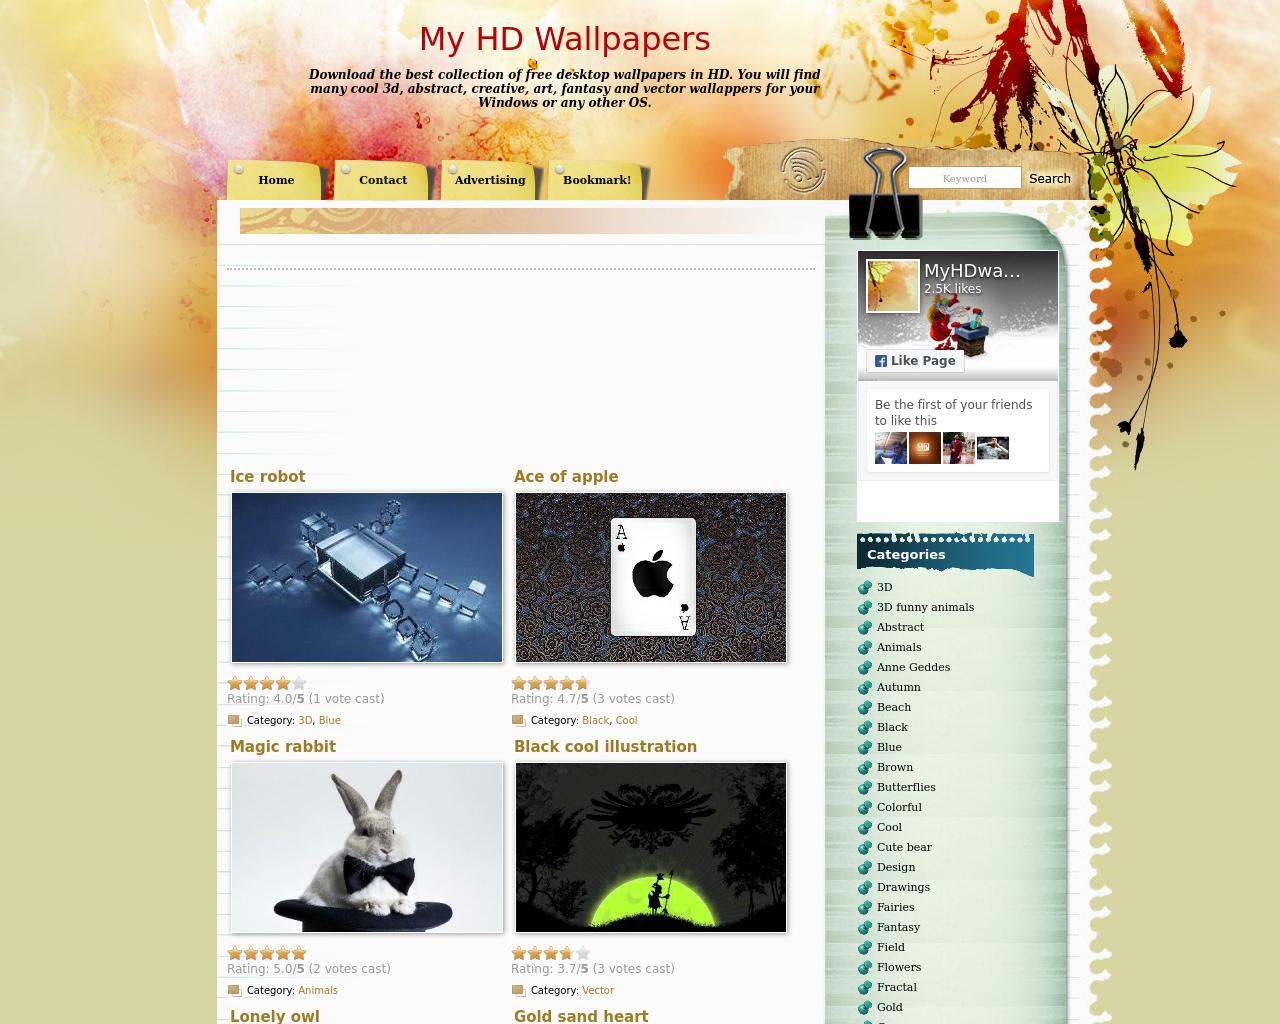 my hd wallpapers advertising mediakits, reviews, pricing, traffic